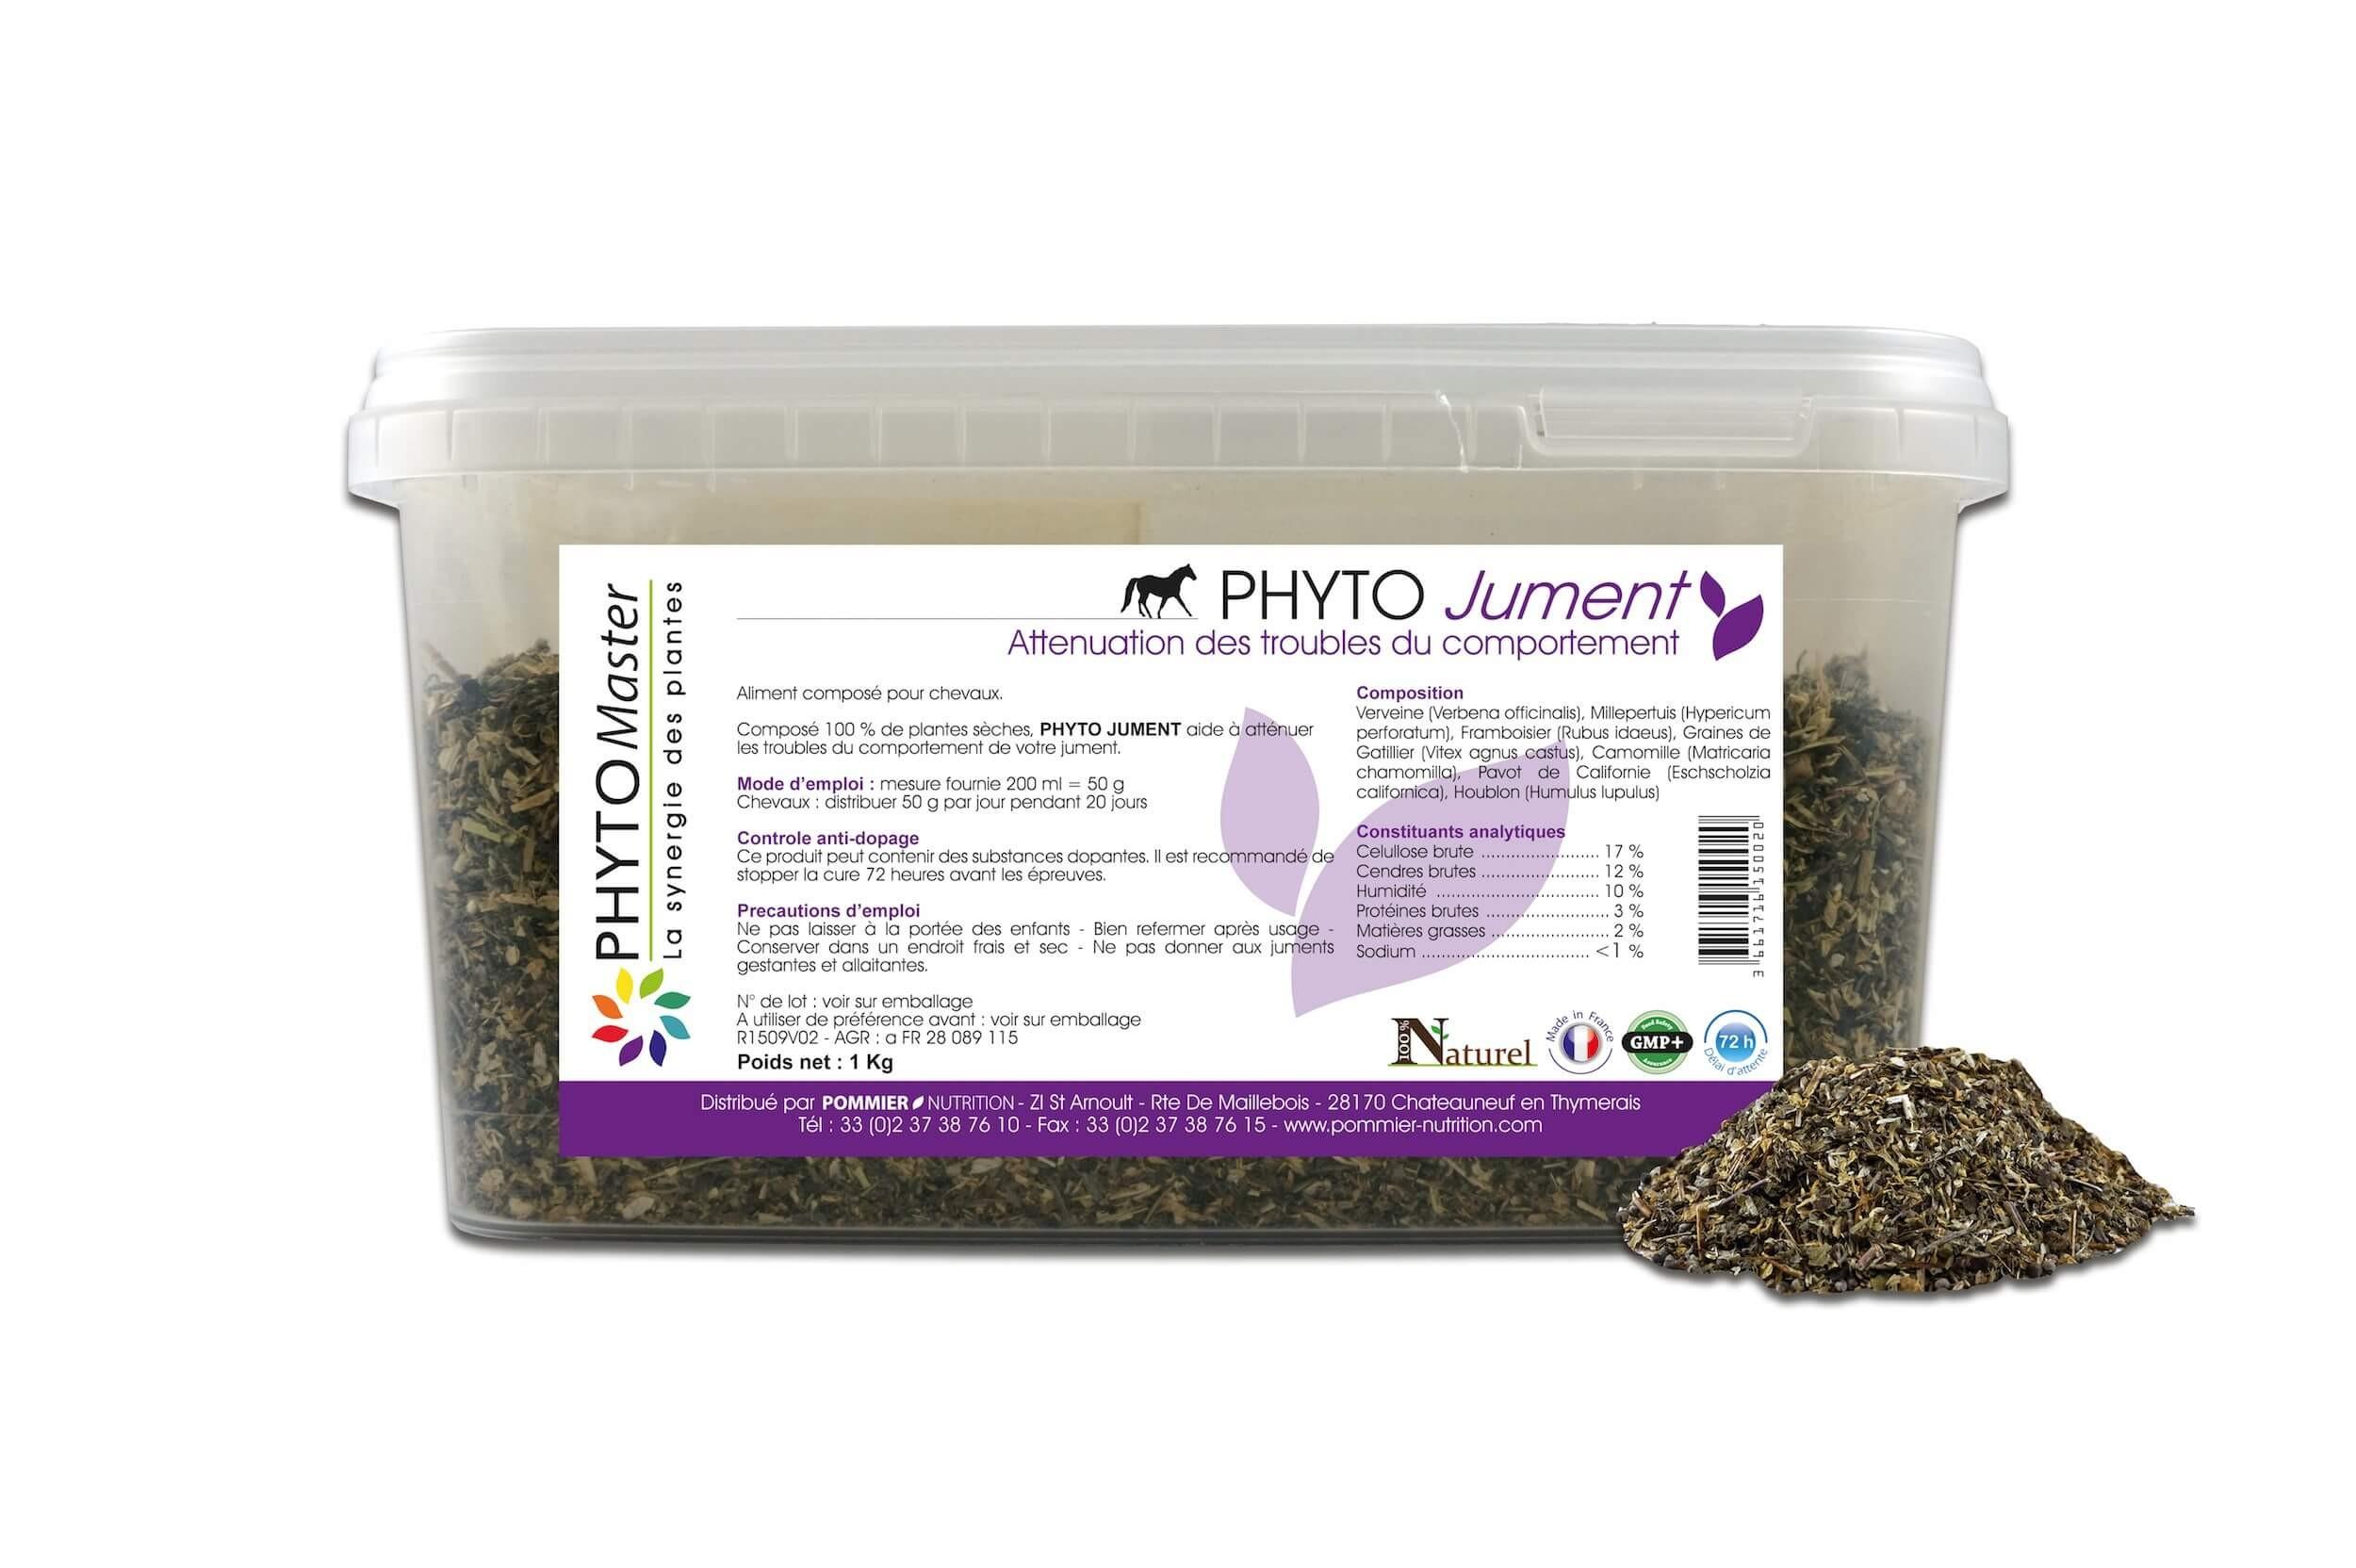 Phyto Master Jument 1 kg - La Compagnie des Animaux